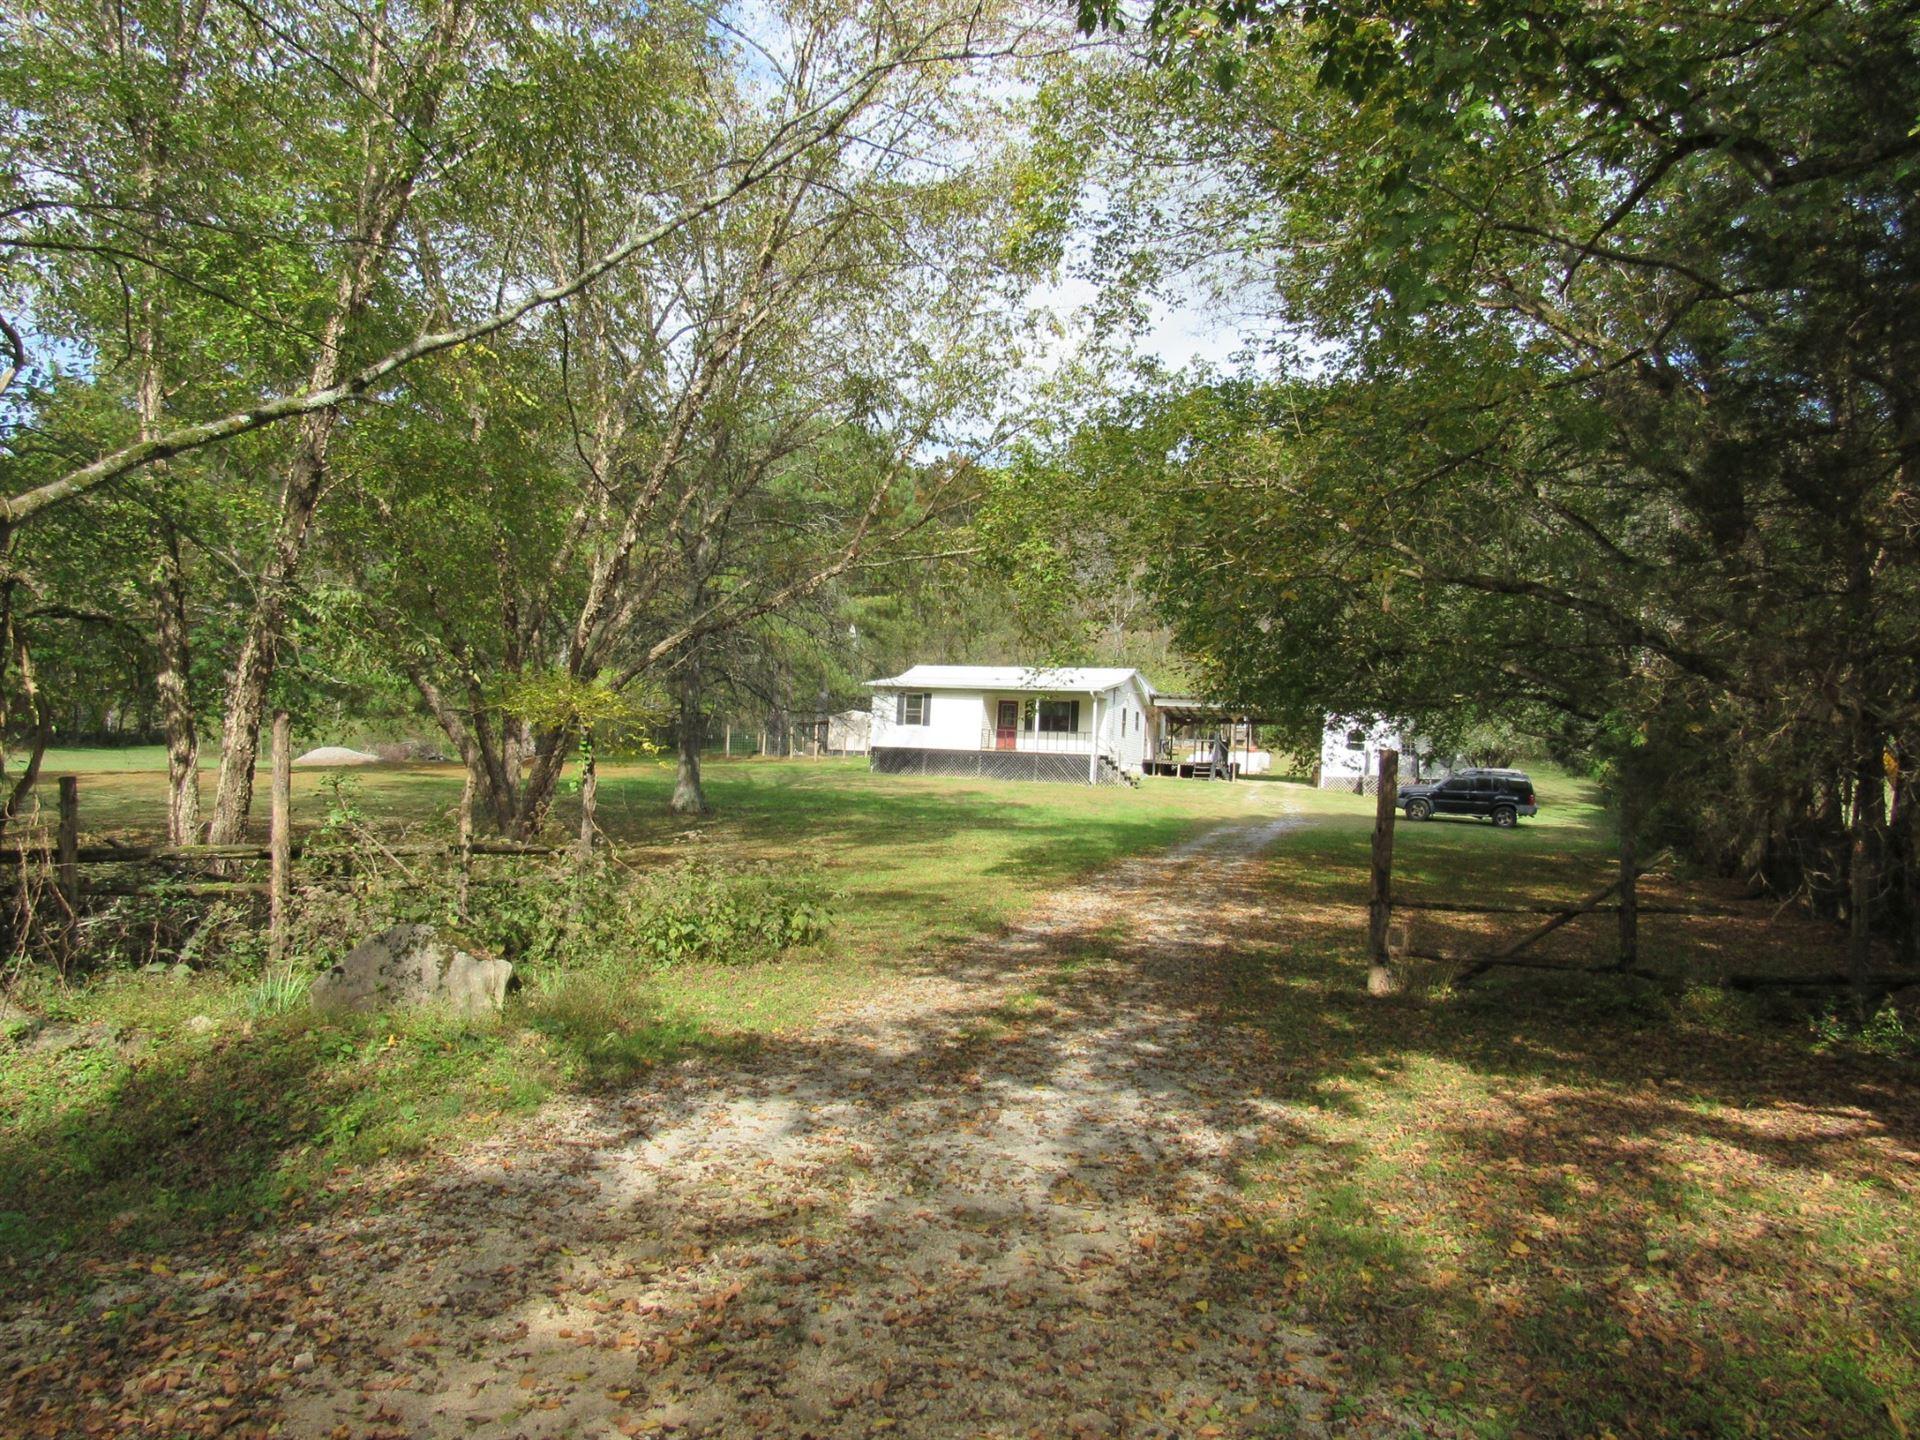 Photo of 826 Hanna Rd, Prospect, TN 38477 (MLS # 2201001)